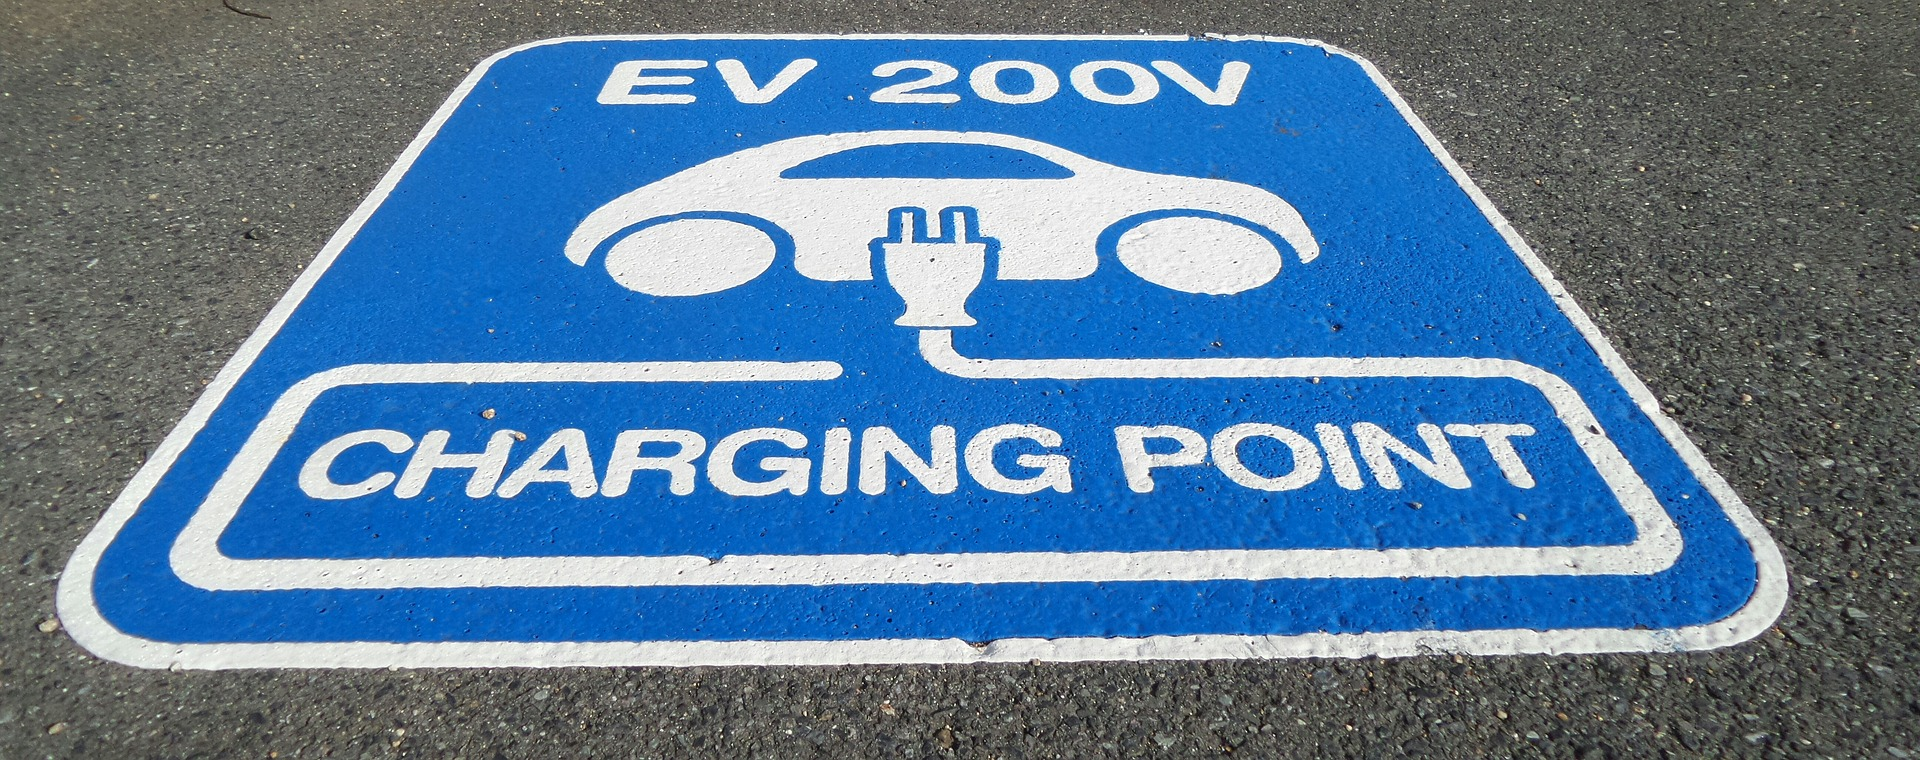 Colonnine di ricarica per l'auto elettrica: soluzioni per i dealer